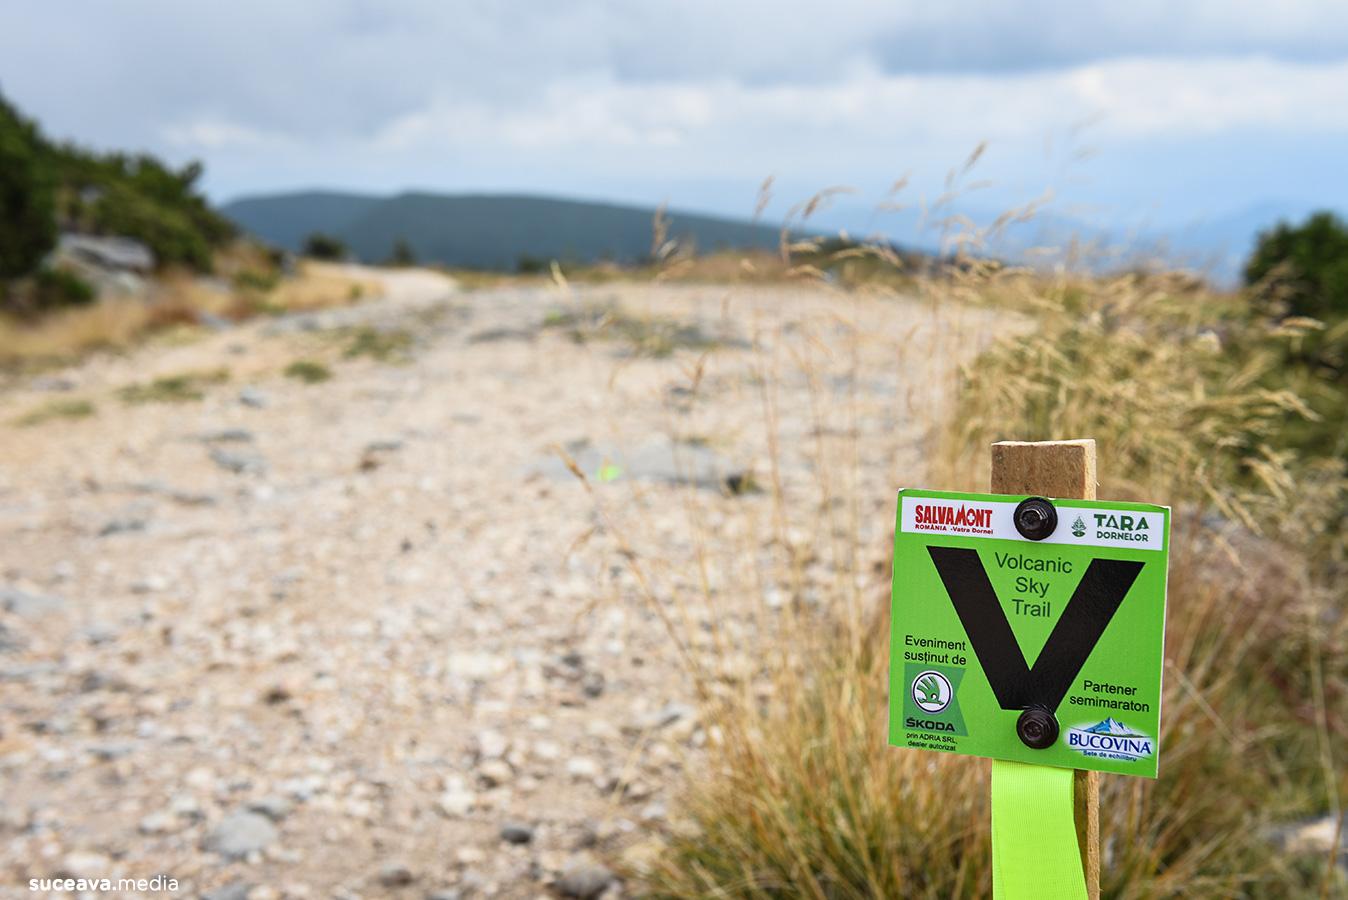 Volcanic Sky Trail (fotoreportaj)